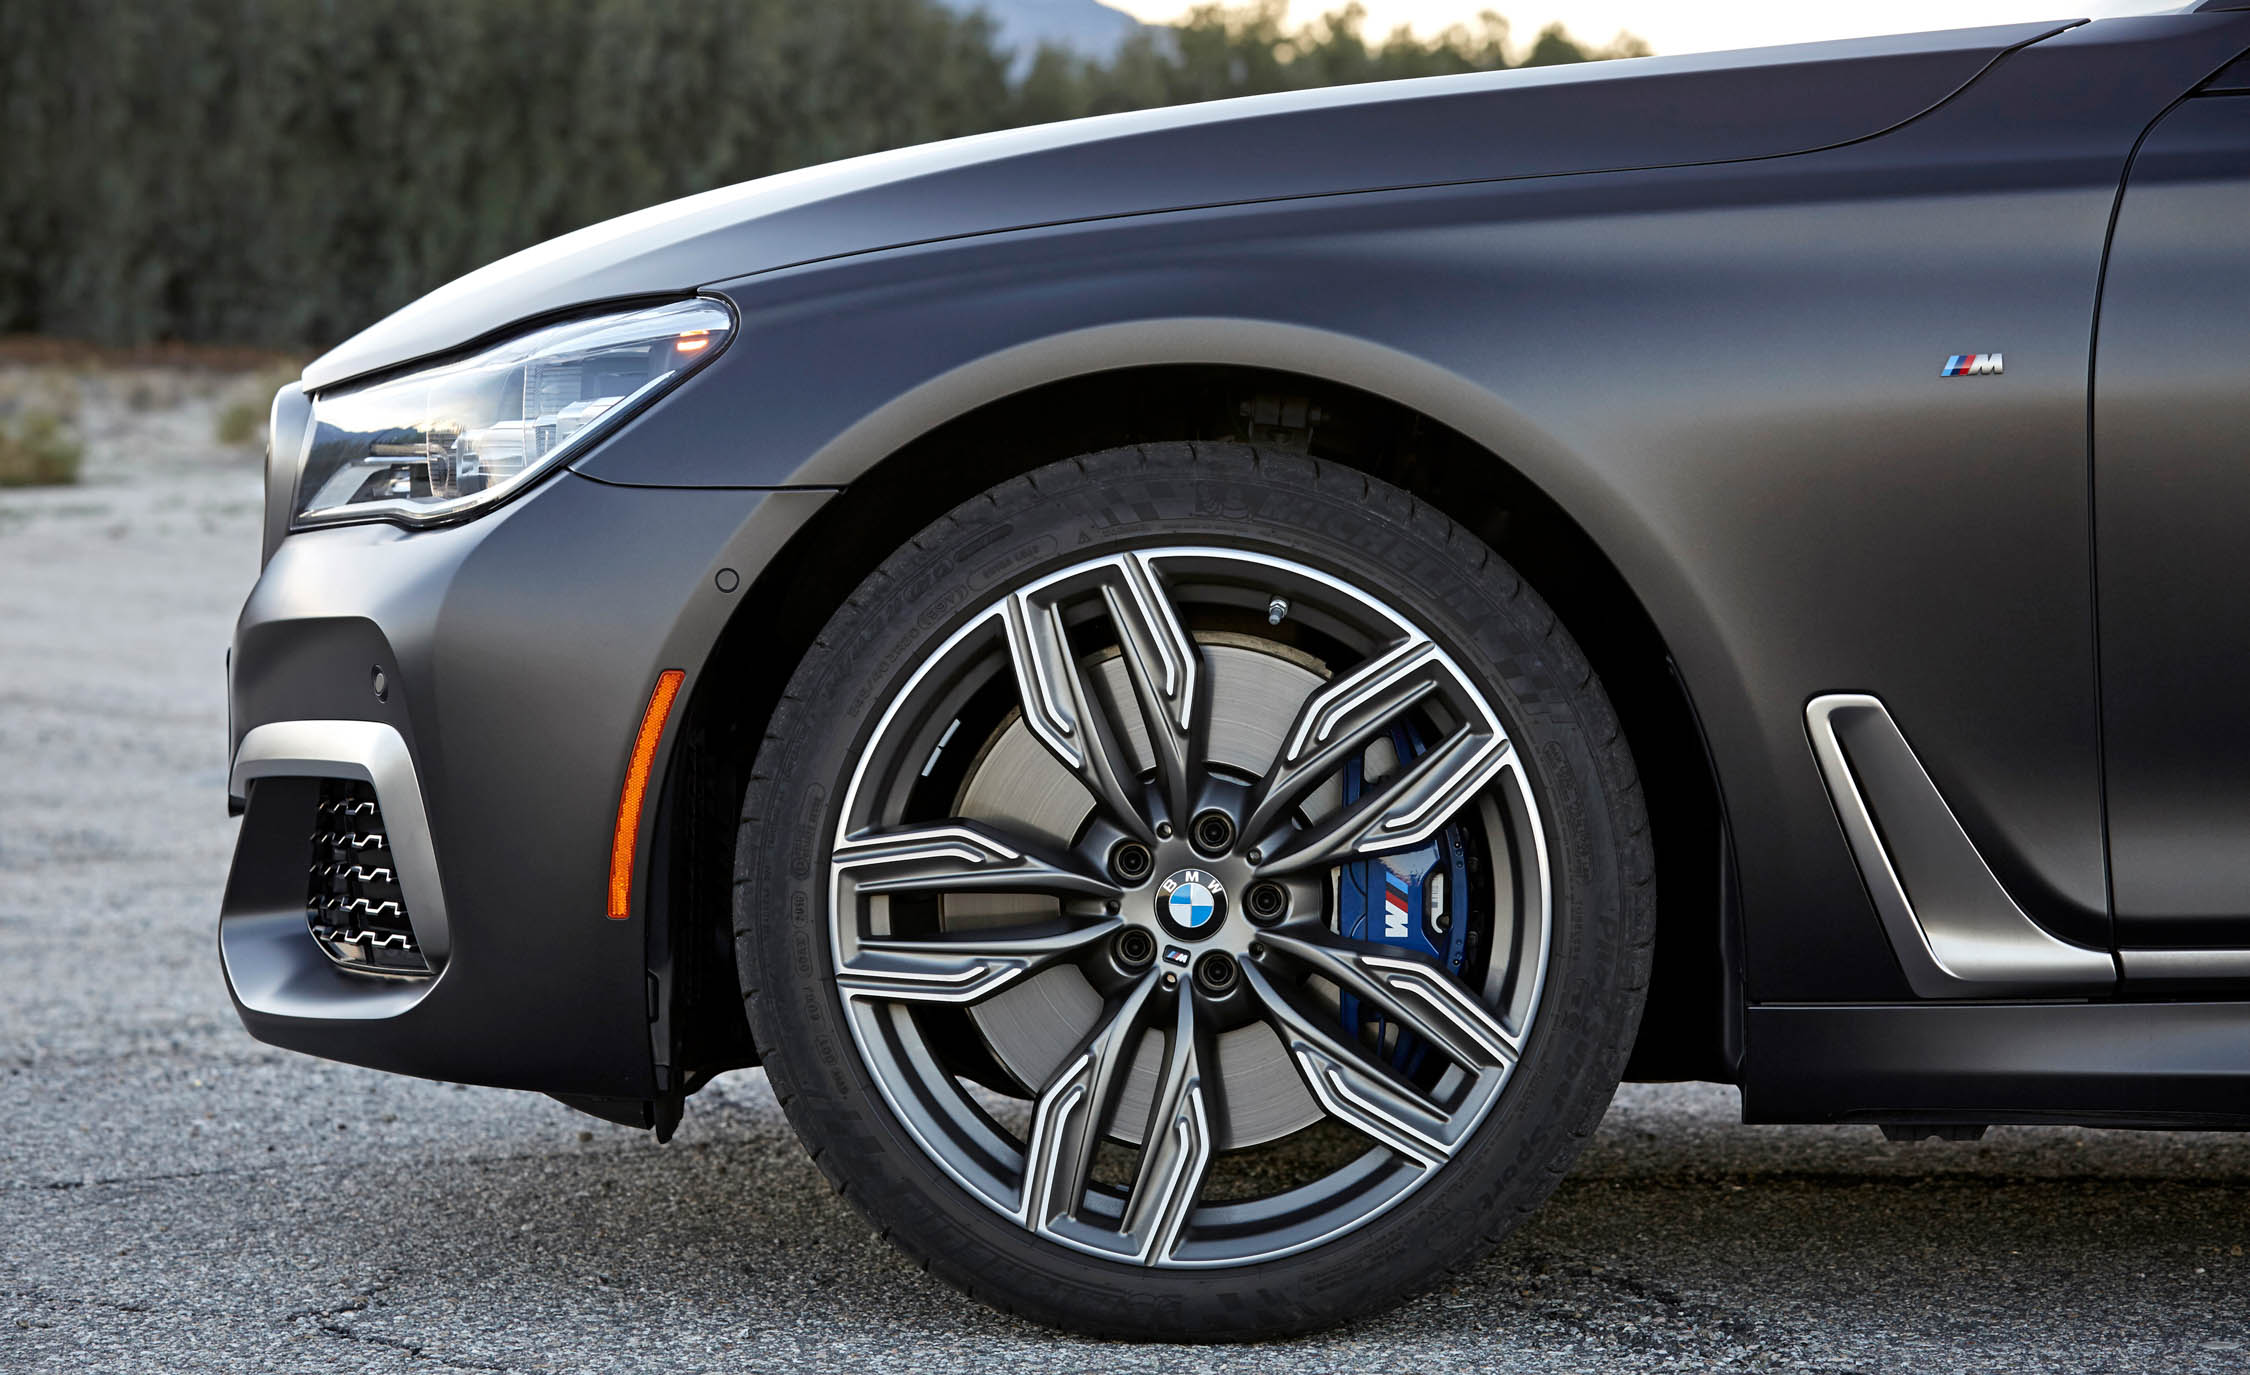 2017 BMW M760i XDrive Exterior View Wheel Trim (Photo 28 of 76)